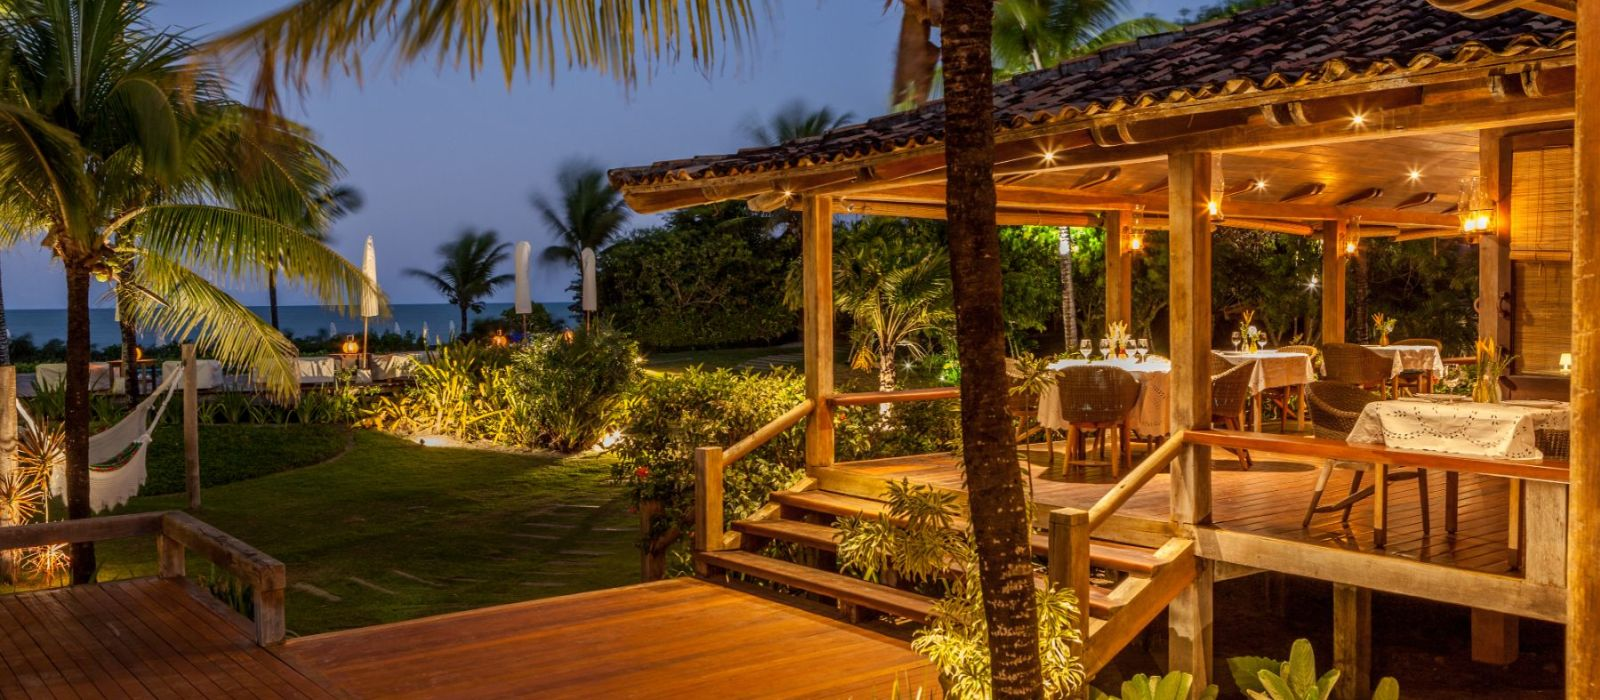 Hotel Estrela D'Agua Brazil